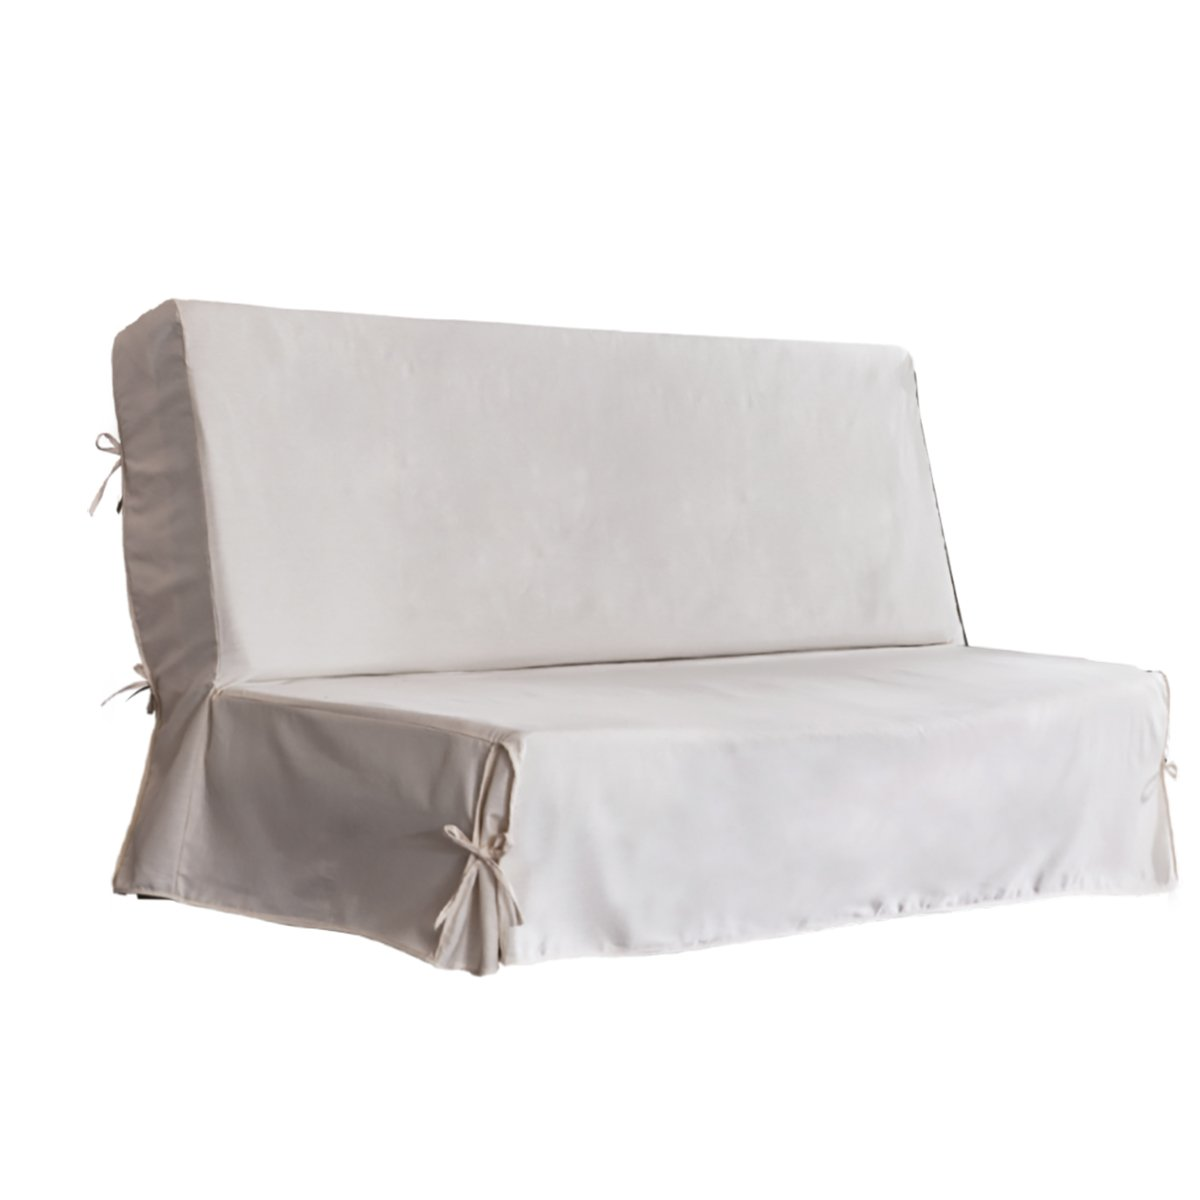 Hug amhccs802001sofa-bed cover cotton Off-White 140x 200cm Blue Bleu Câlin